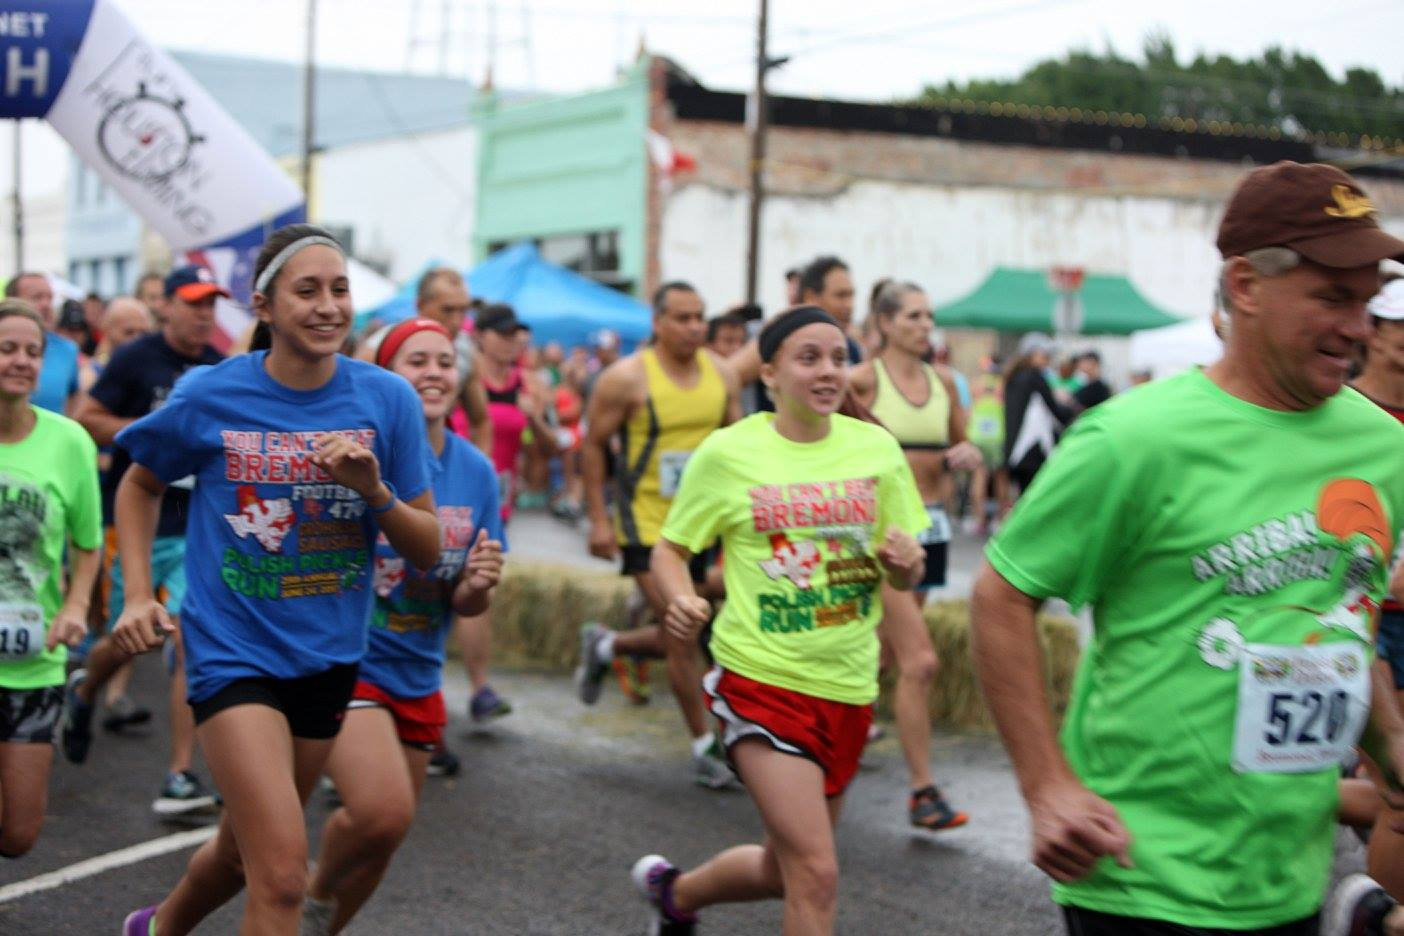 Bremond Polish Pickle Runners Youth 5K Run